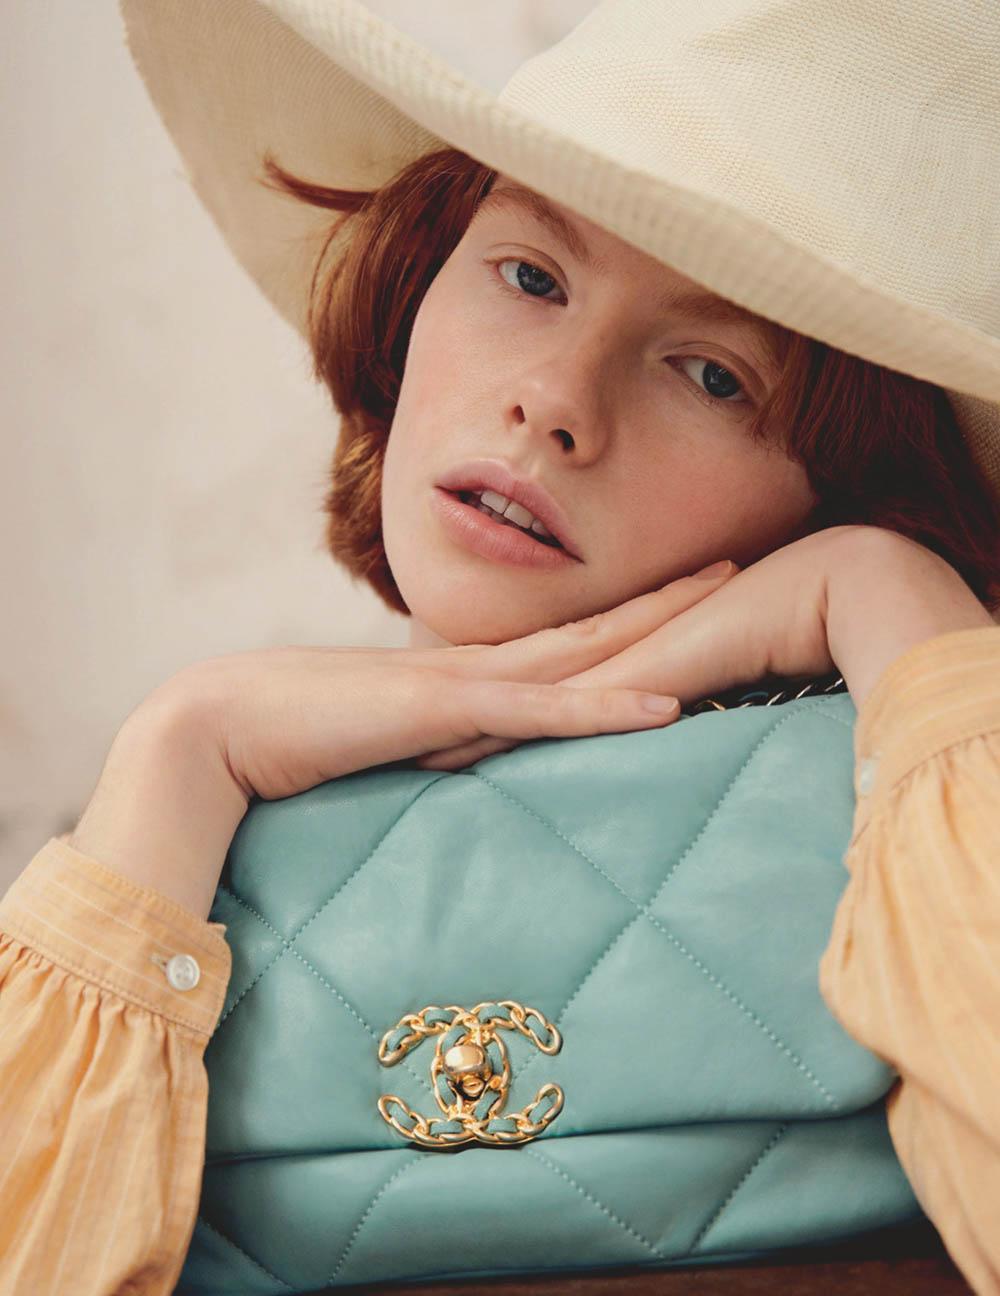 Edwina Preston by Joan Braun for Vogue Russia February 2020